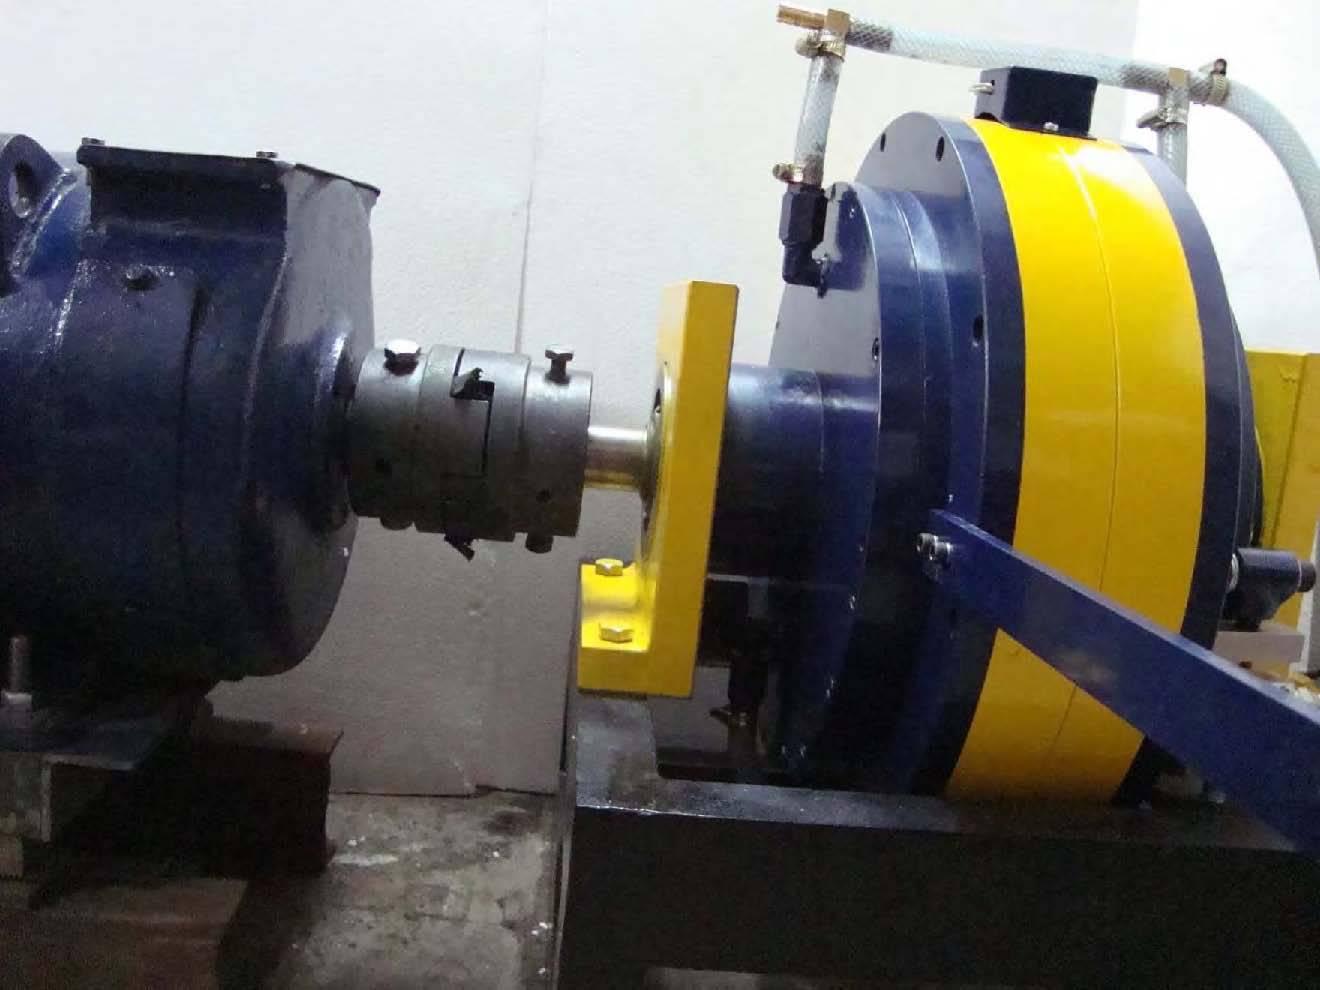 Motor Test Eddy Current Dynamometer Application Systems